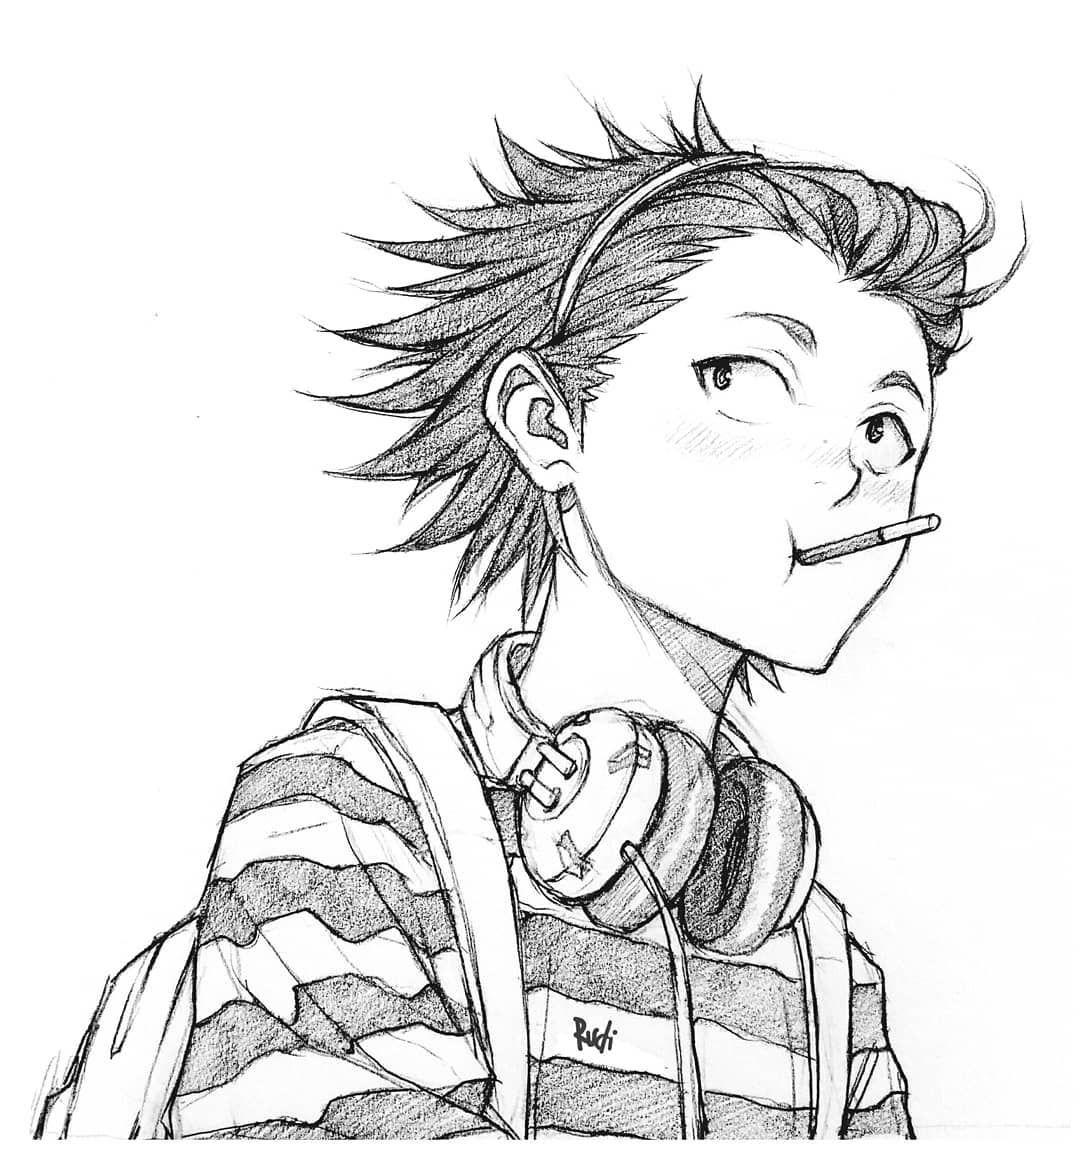 Fanart Udah Lama Nonton Anime Ini Tapi Tetep Aja Kisahnya Masih Membekas Karakternya Keren Keren Tapi Lupa Siapa Nama Da Anime Artwork Manga Art Pokemon Art